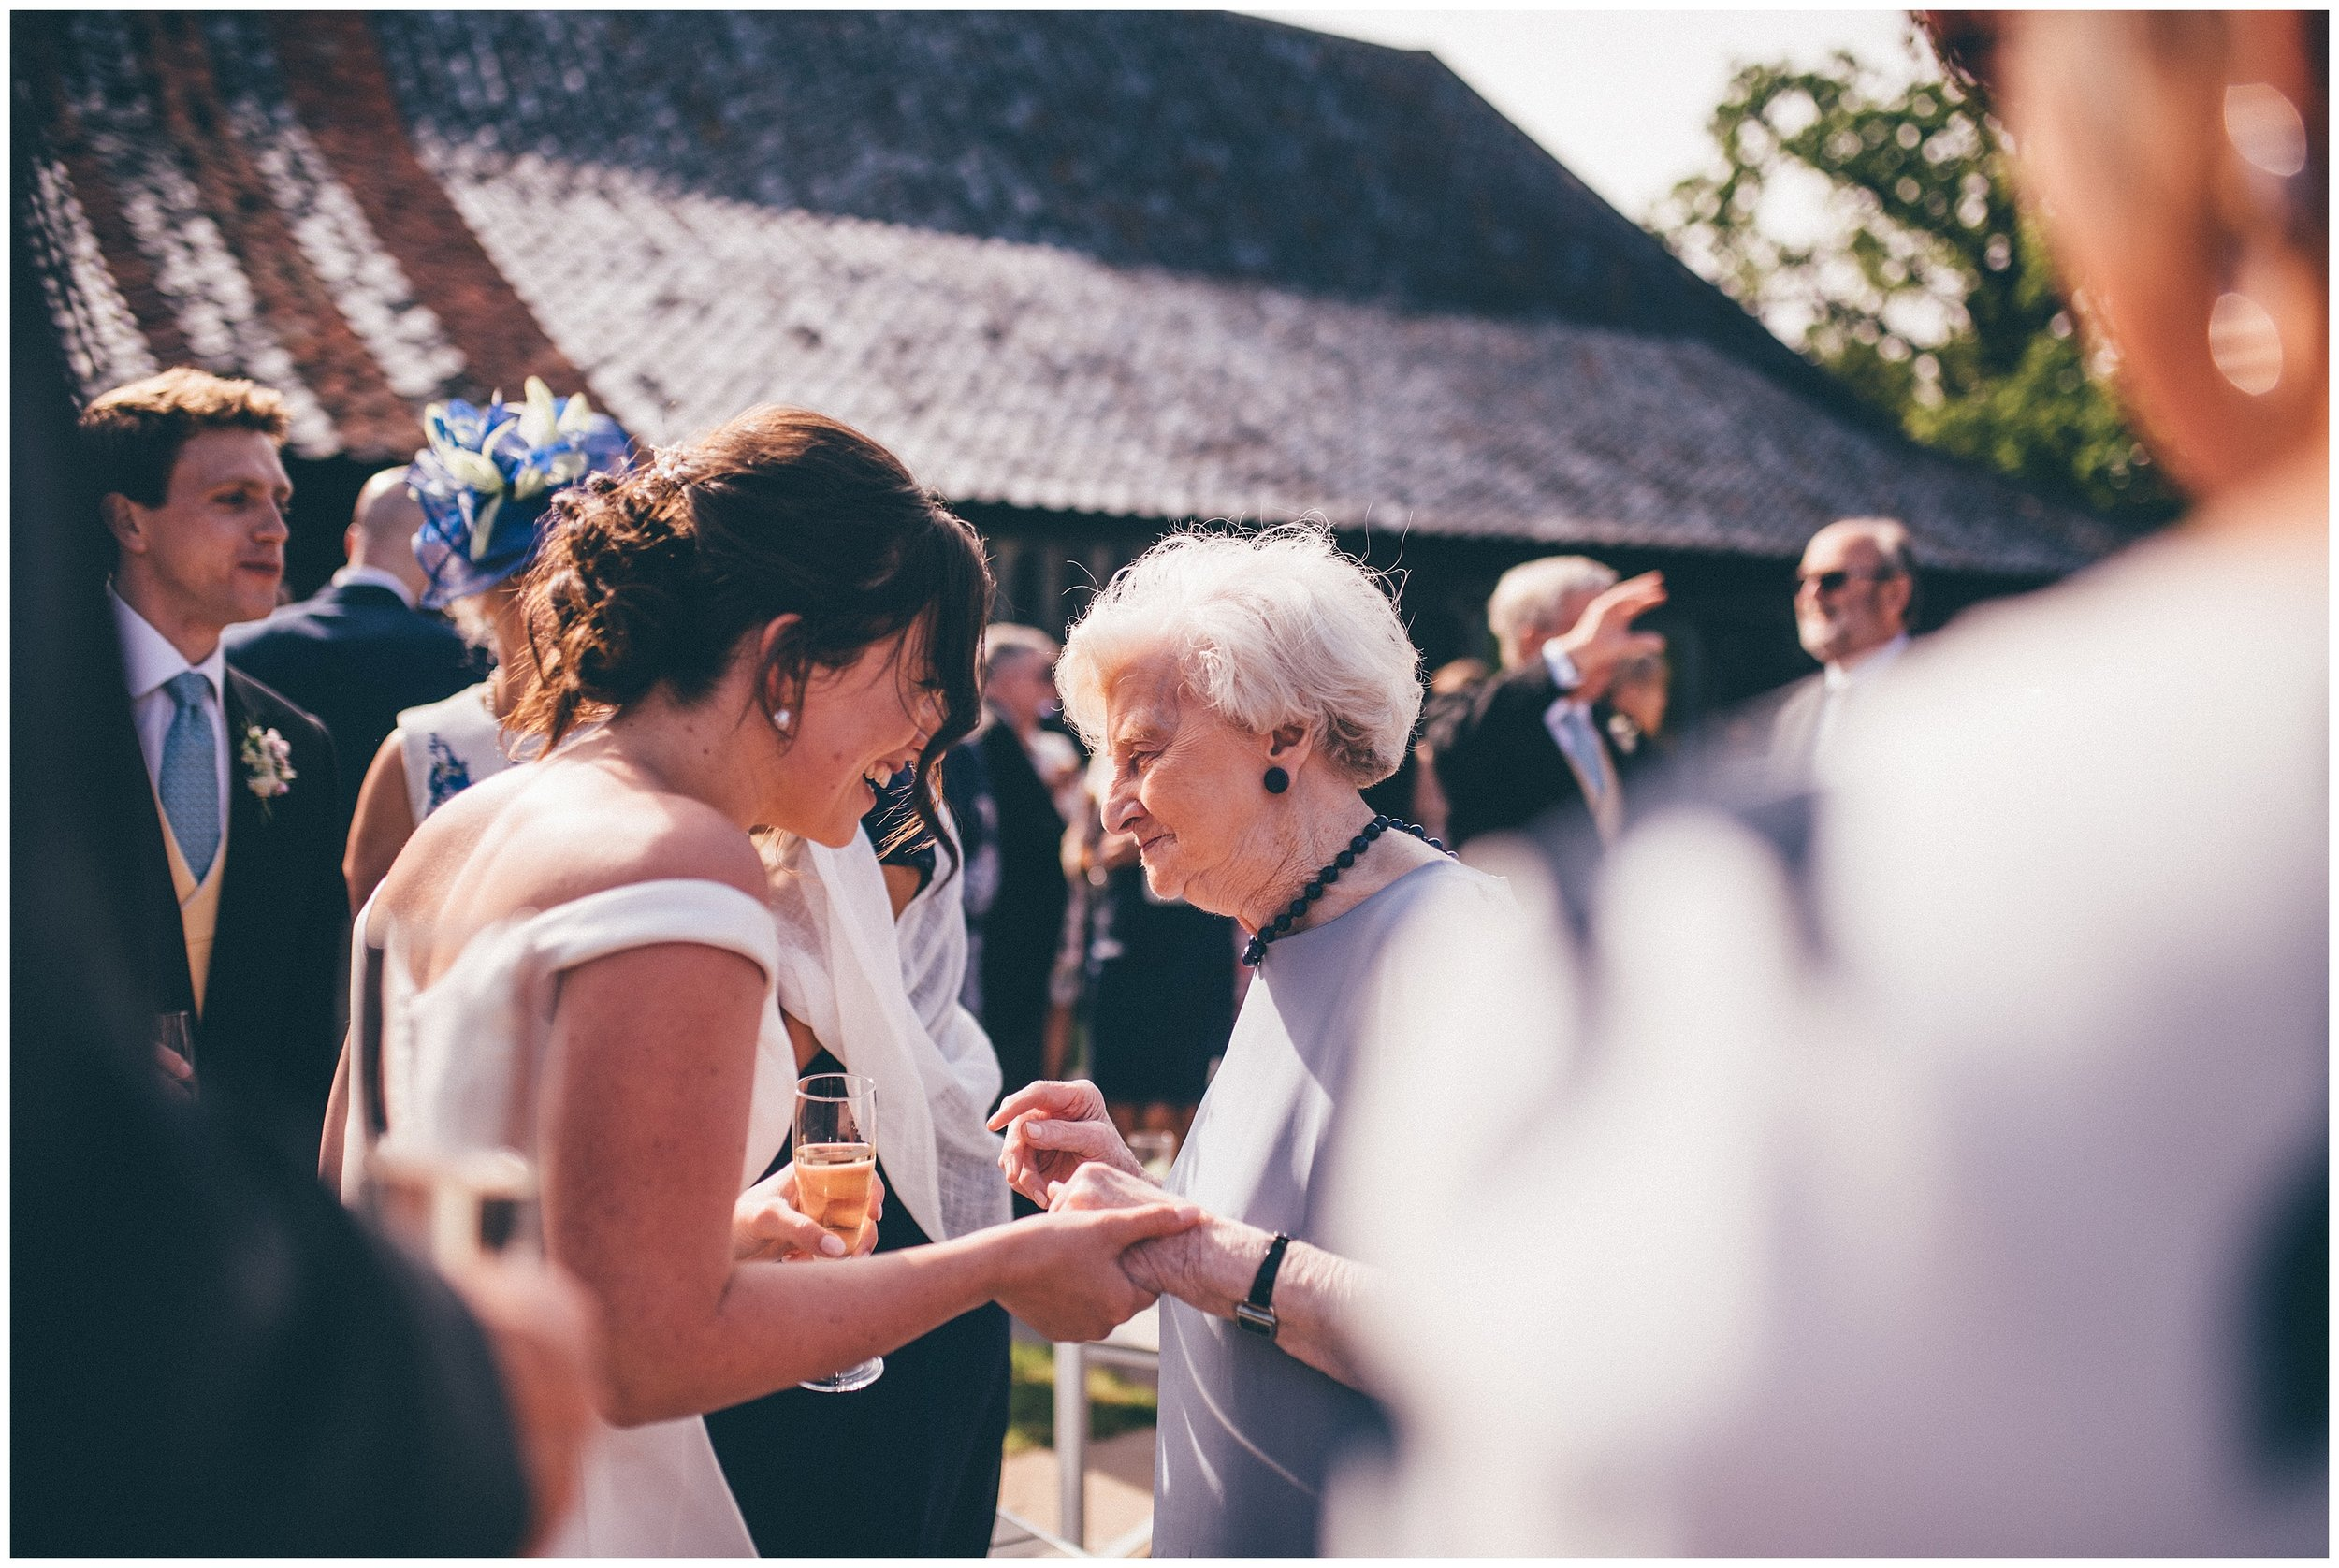 Wedding guests enjoying the reception at Henham Park wedding barns.